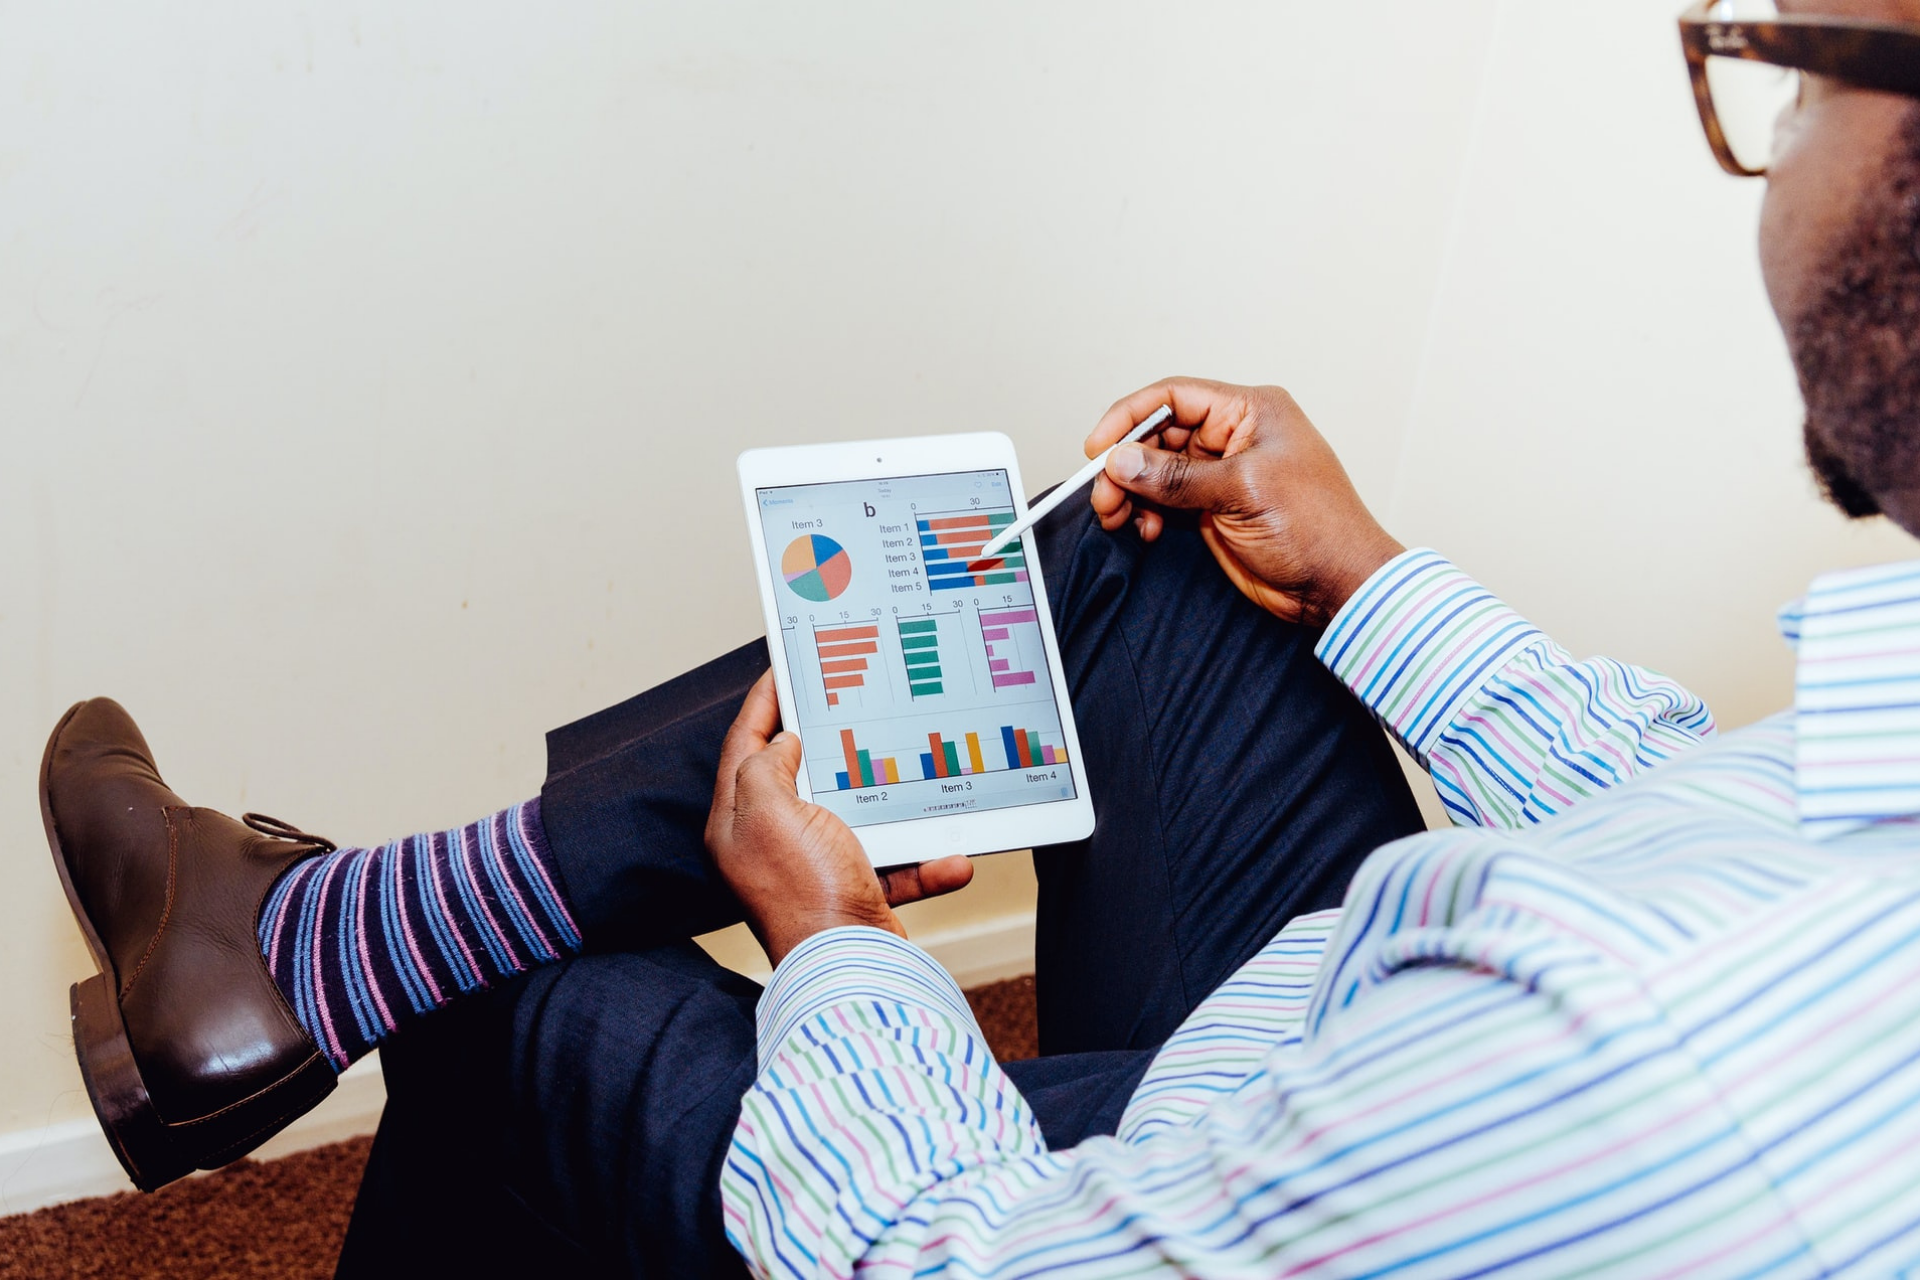 Proactive workforce forecasting